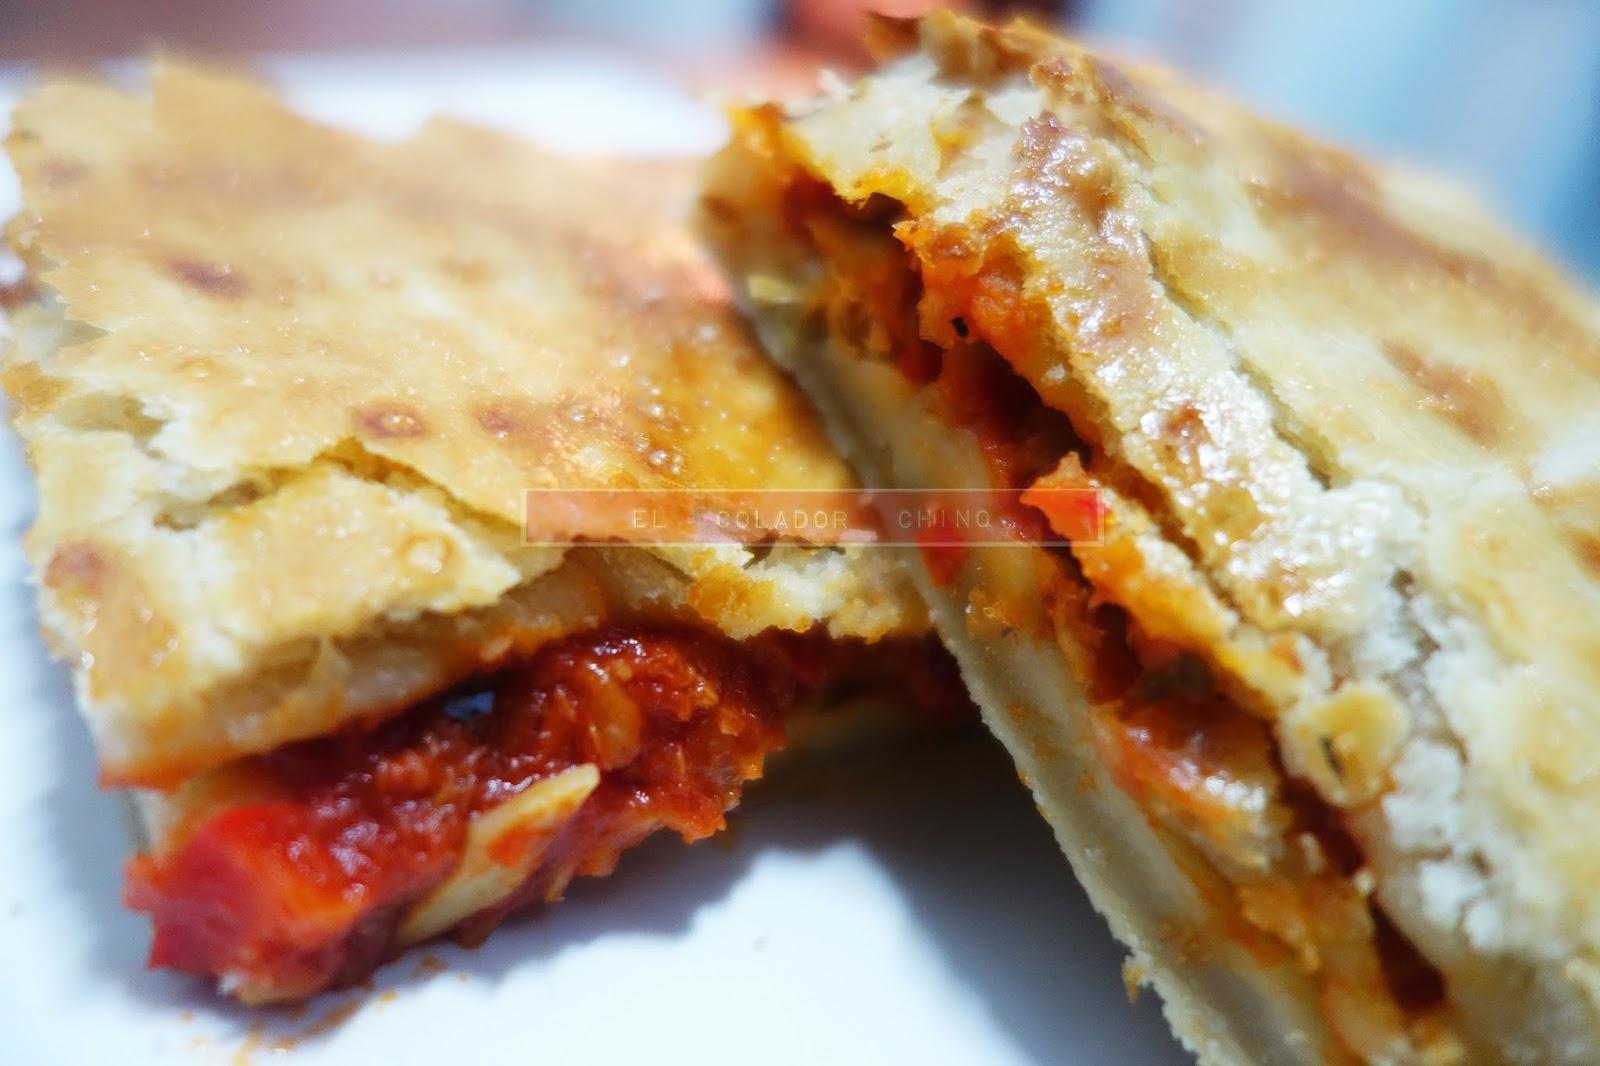 Empanada galega - ELCOLADORCHINO